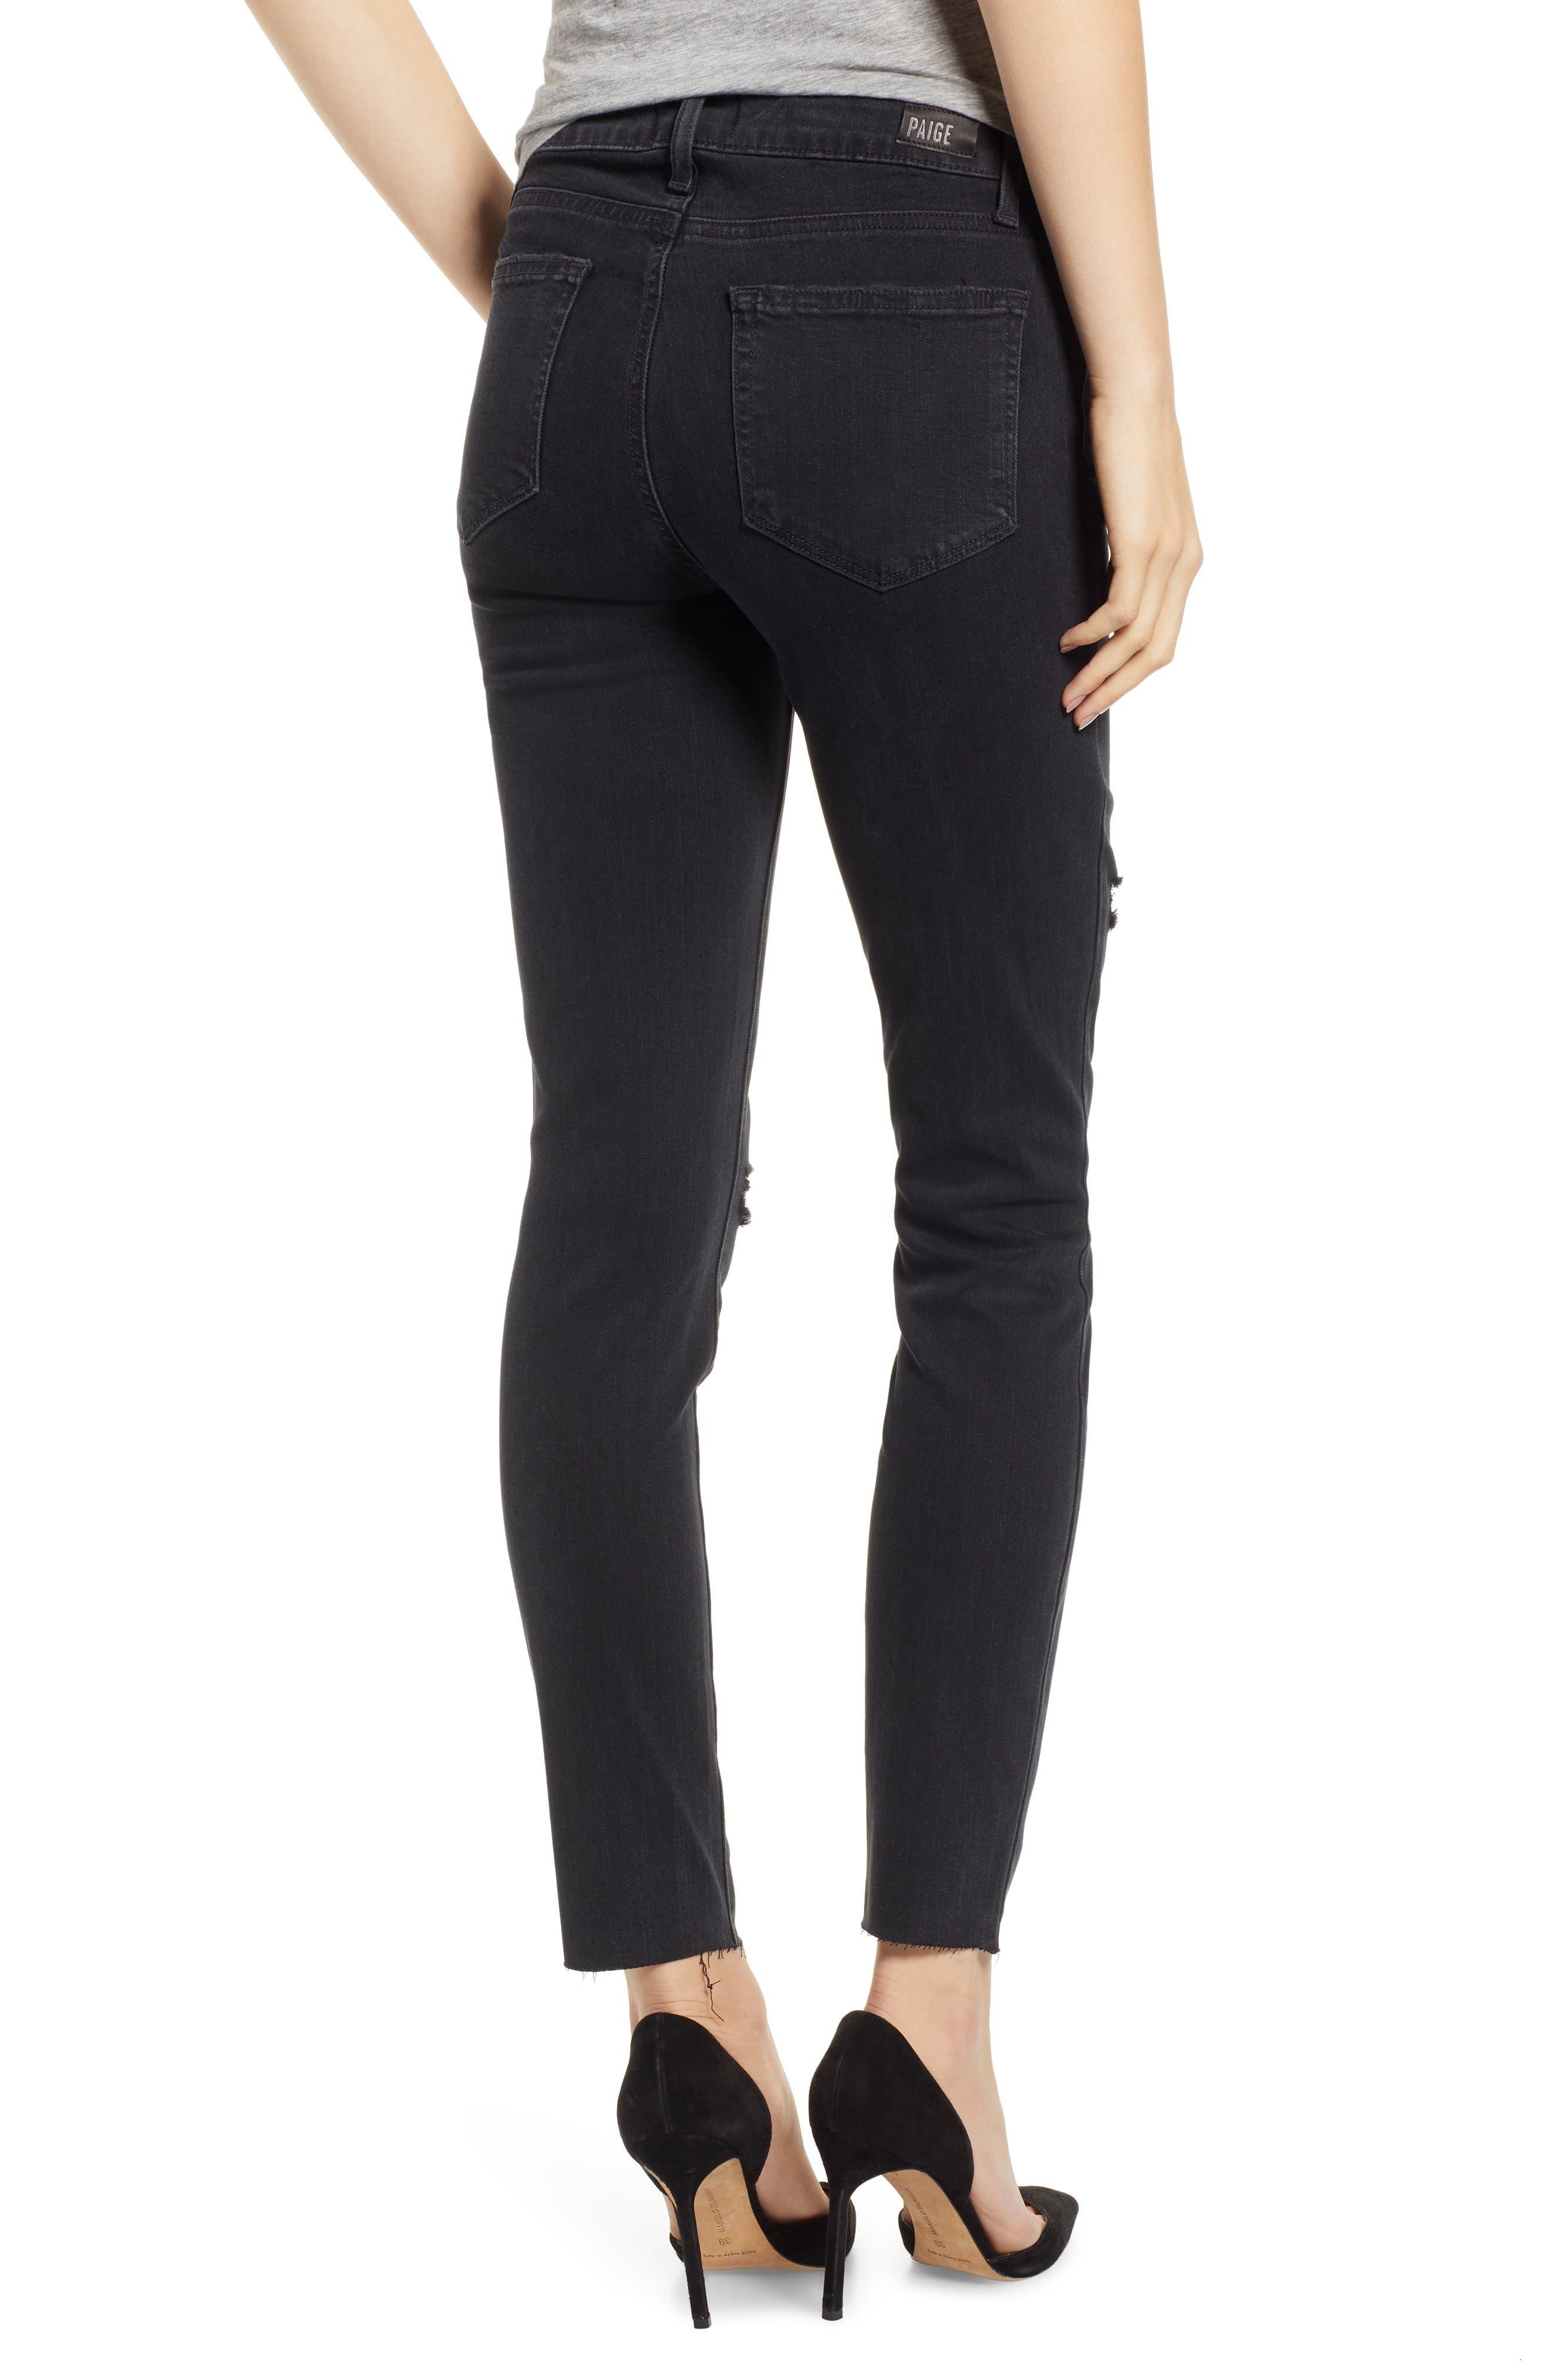 PAIGE, Transcend - Verdugo Ankle Skinny Jeans, Alternate thumbnail 2, color, 001